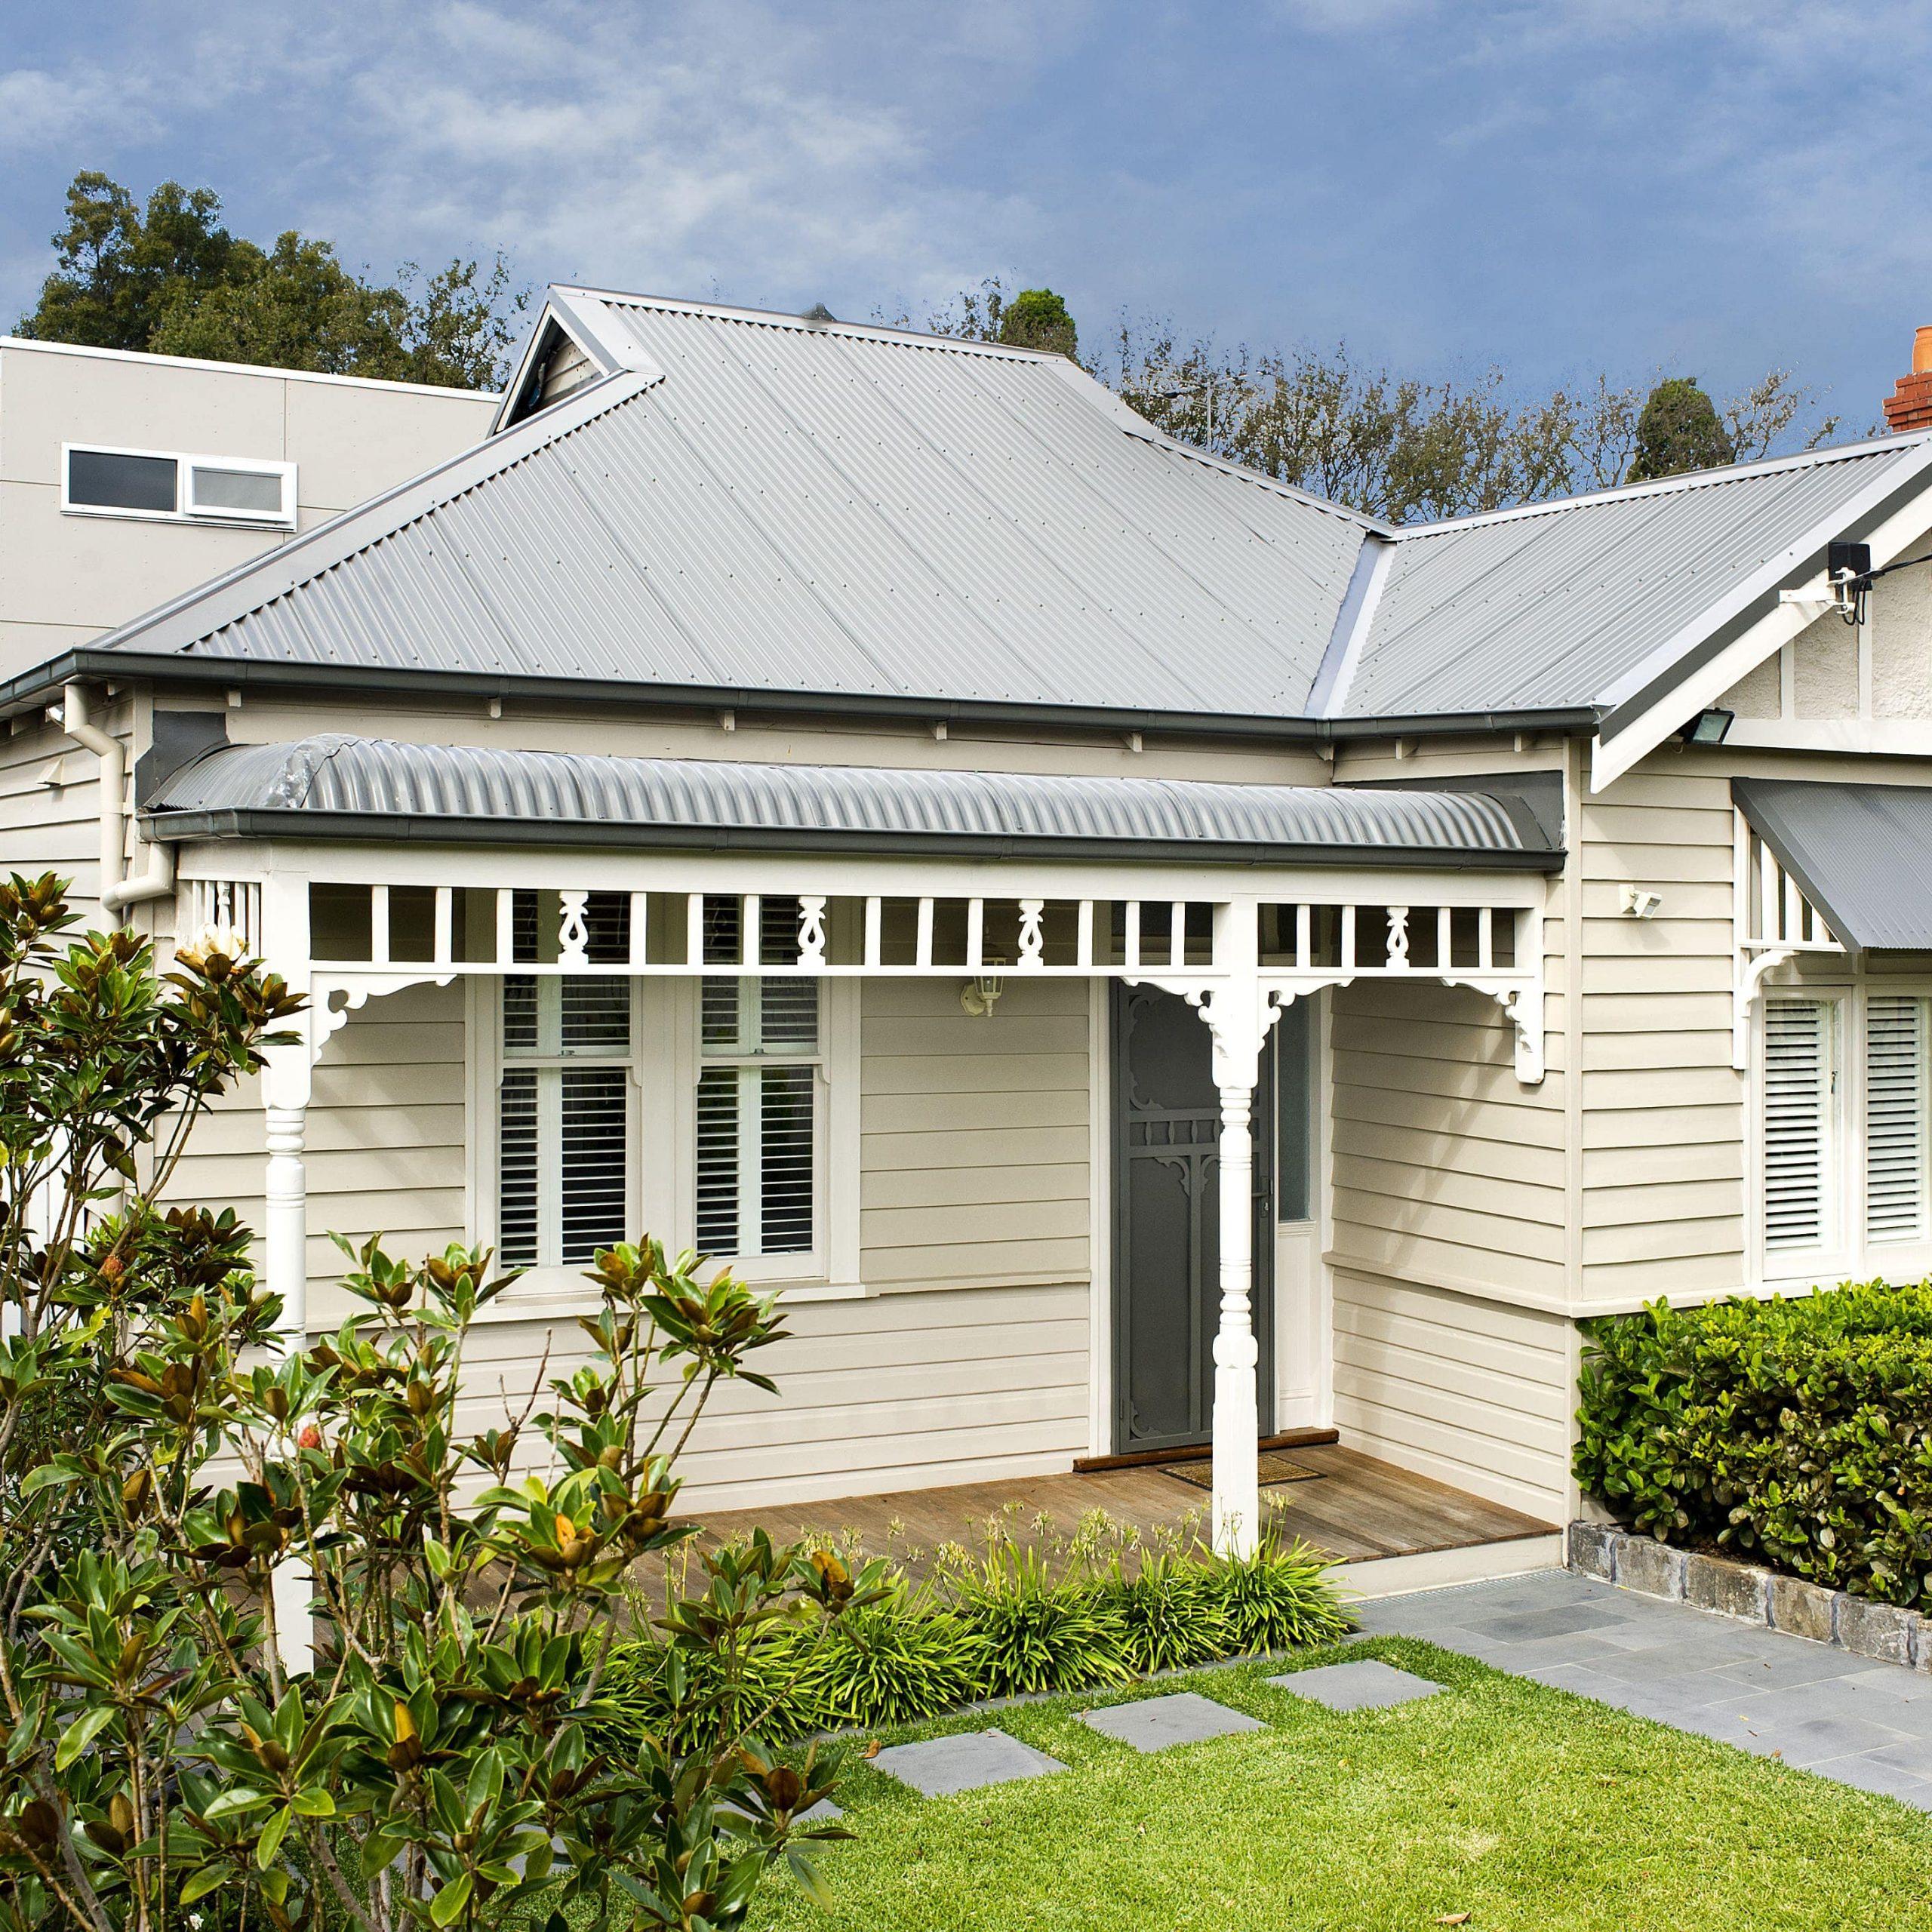 Benefits To Choose Knock Down Rebuild Rather Than Renovating Home